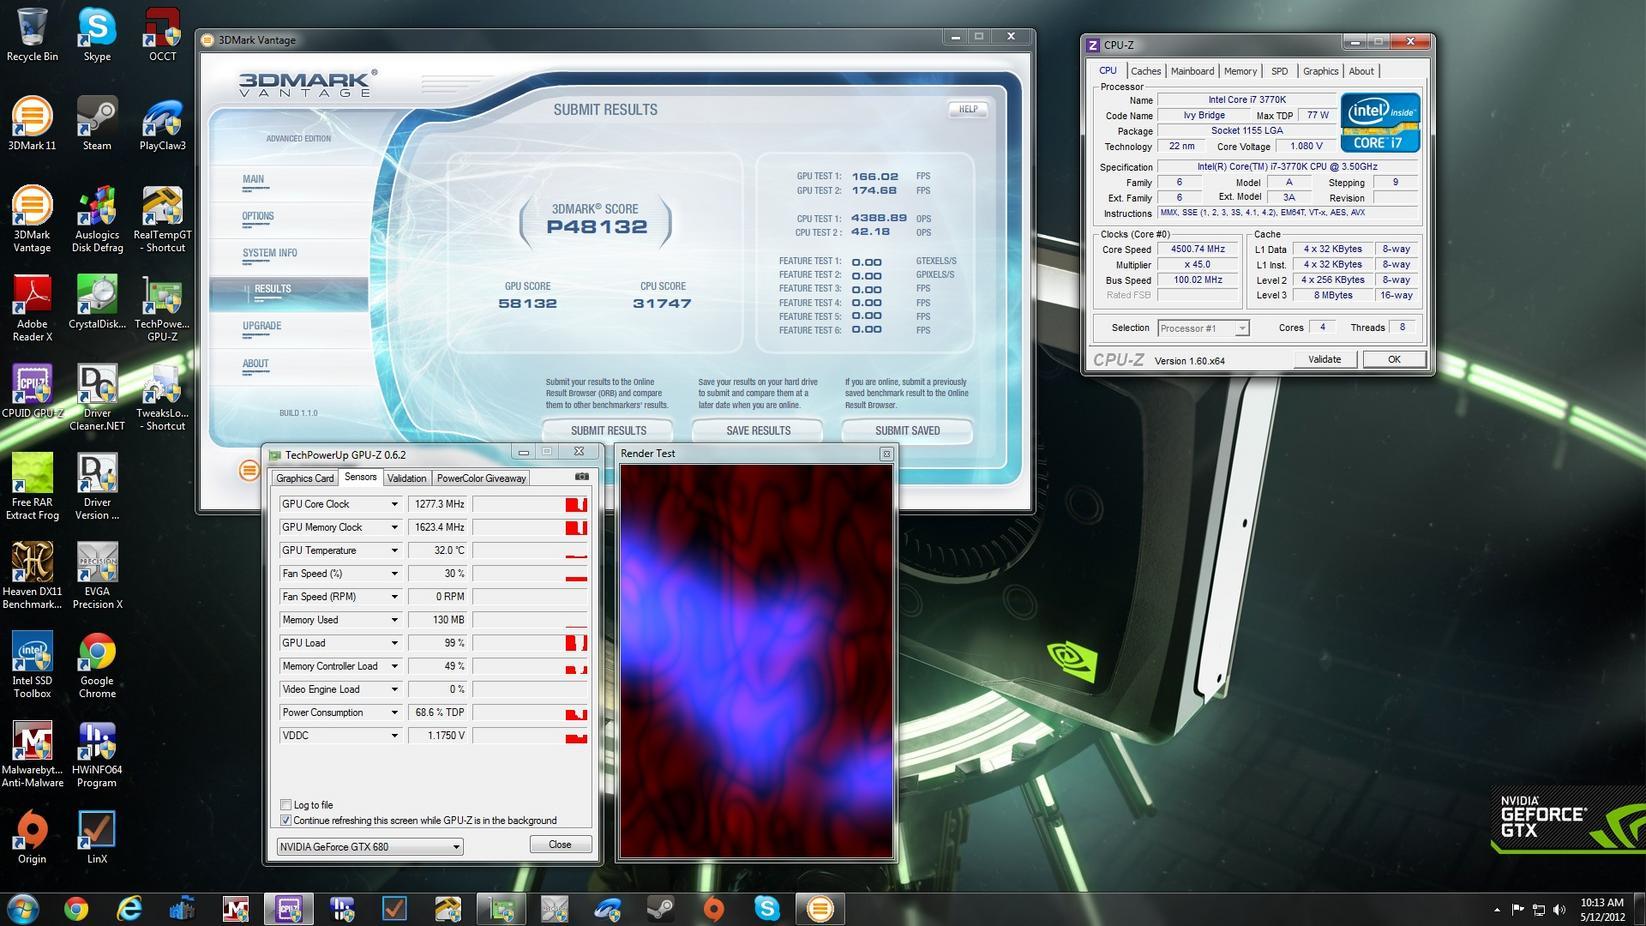 3DmarkV 1277_1623 GPU58132 P48132.jpg